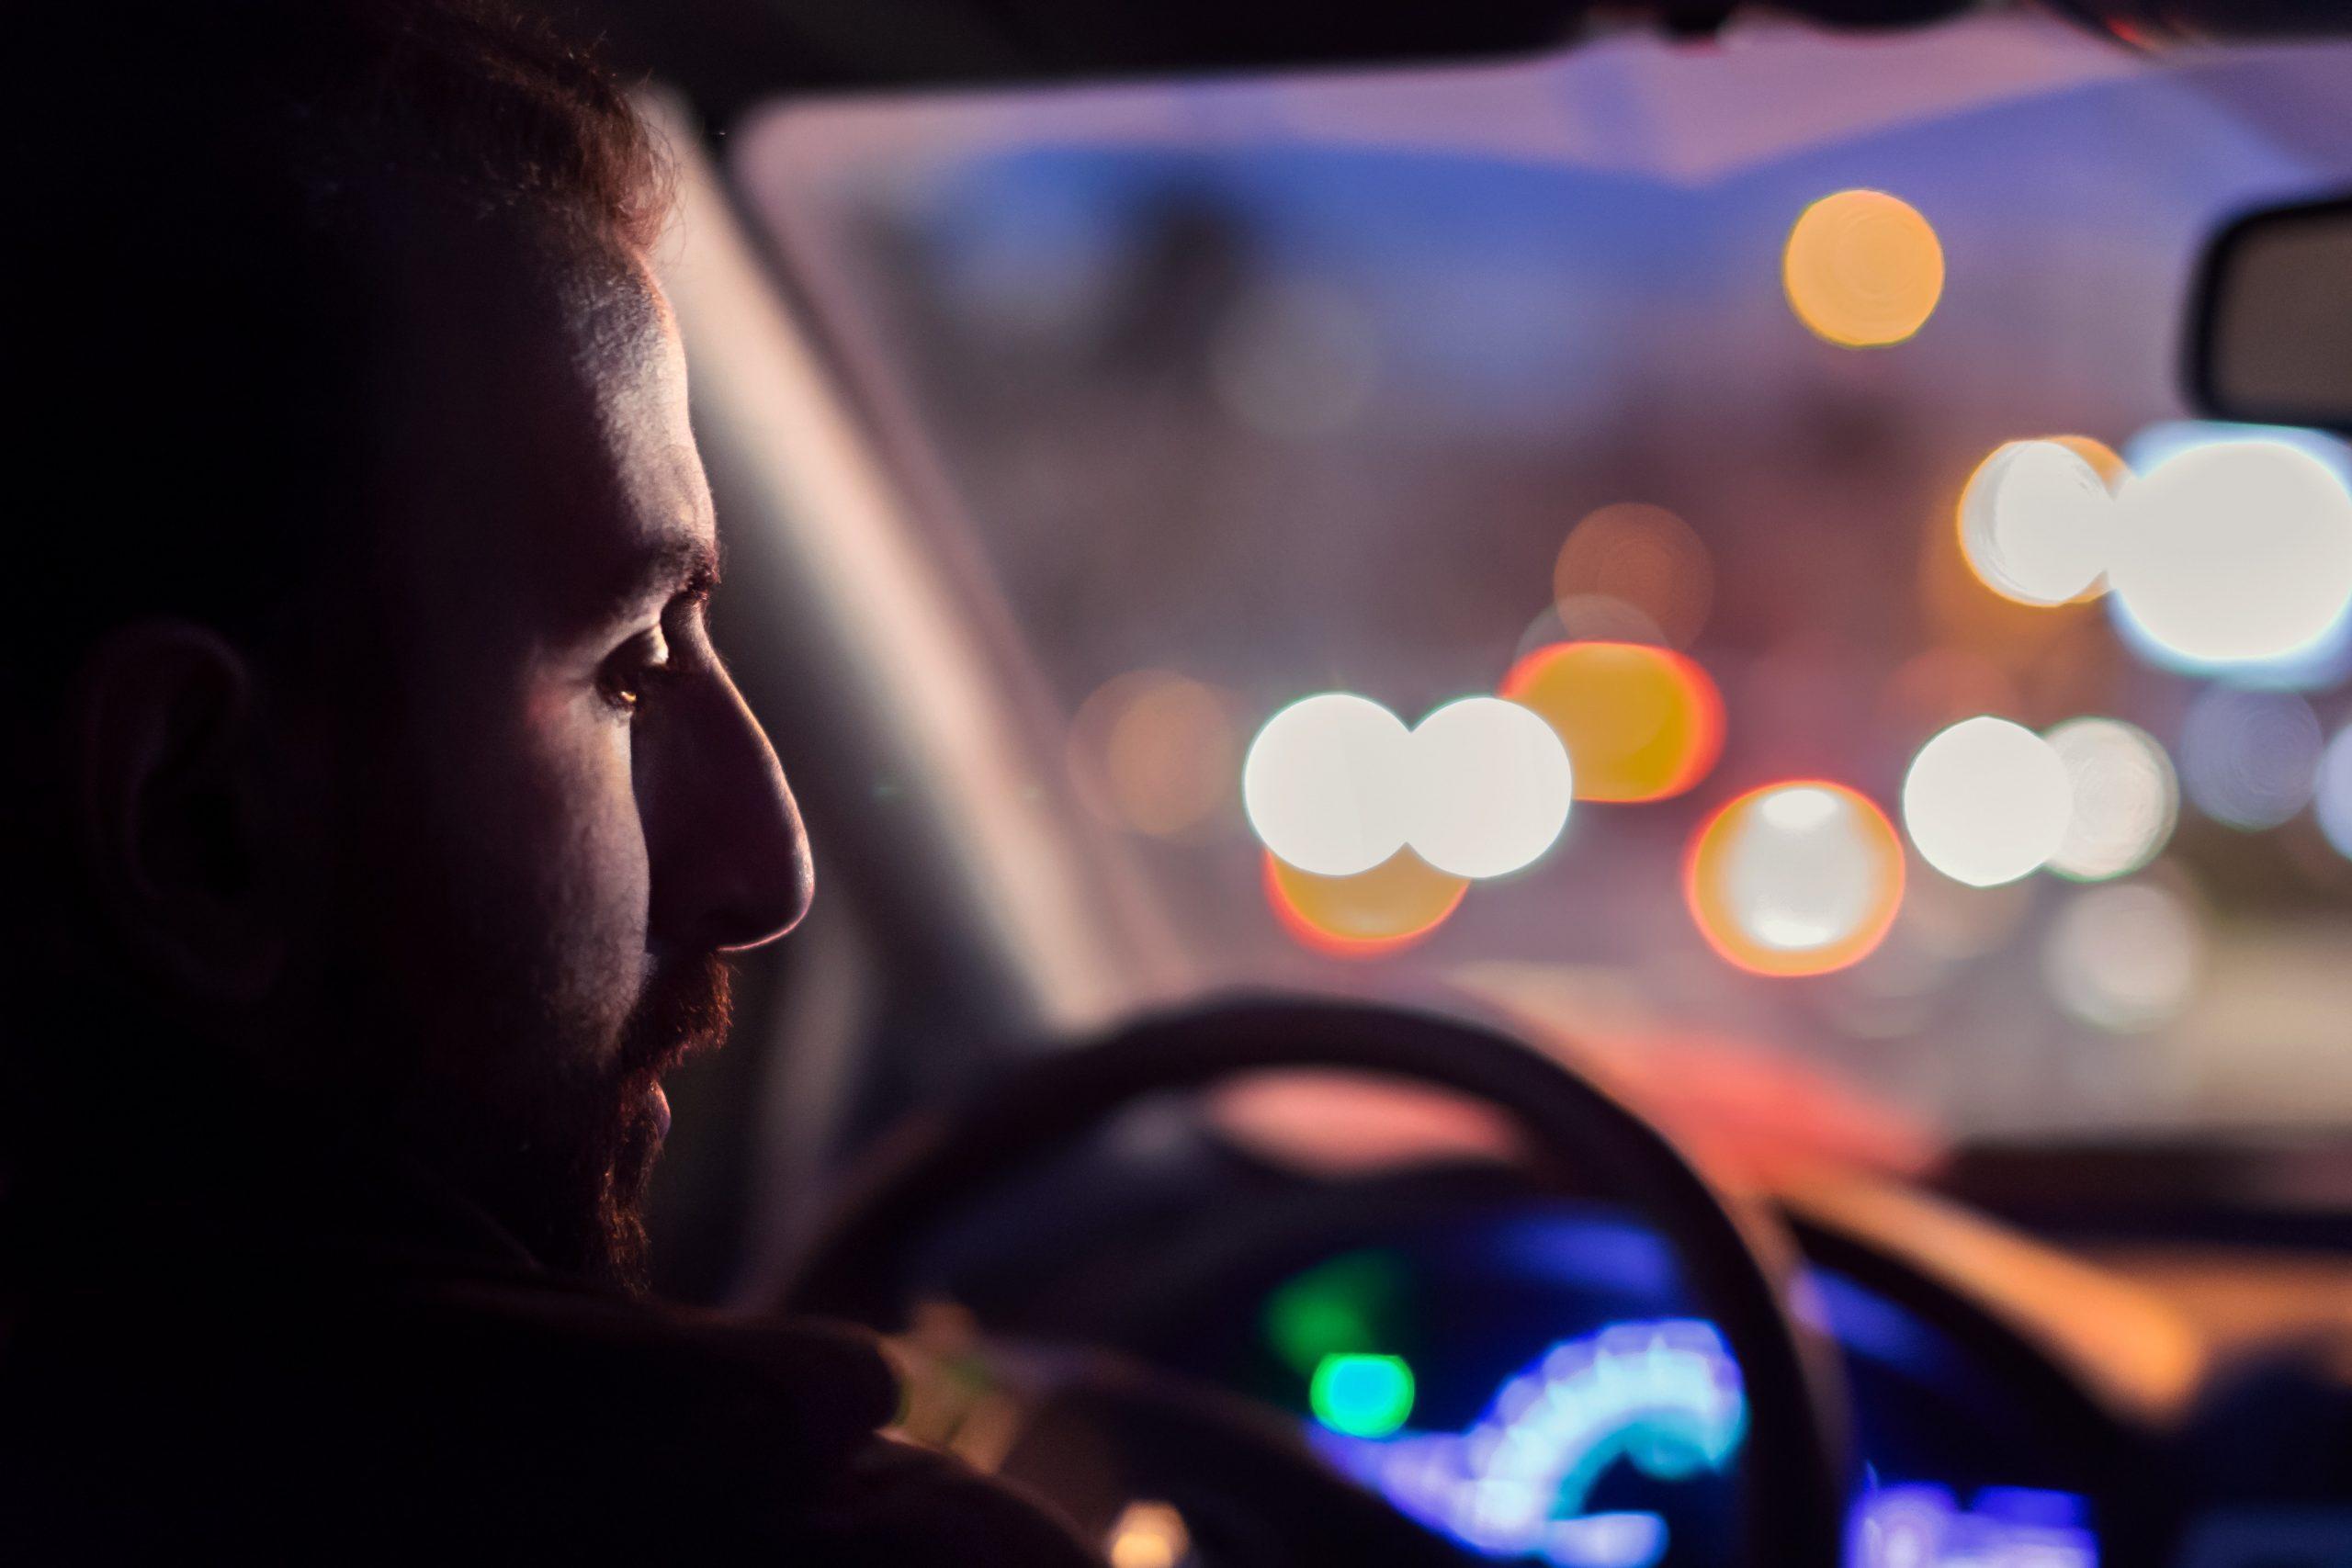 praten tegen auto - man in de nacht